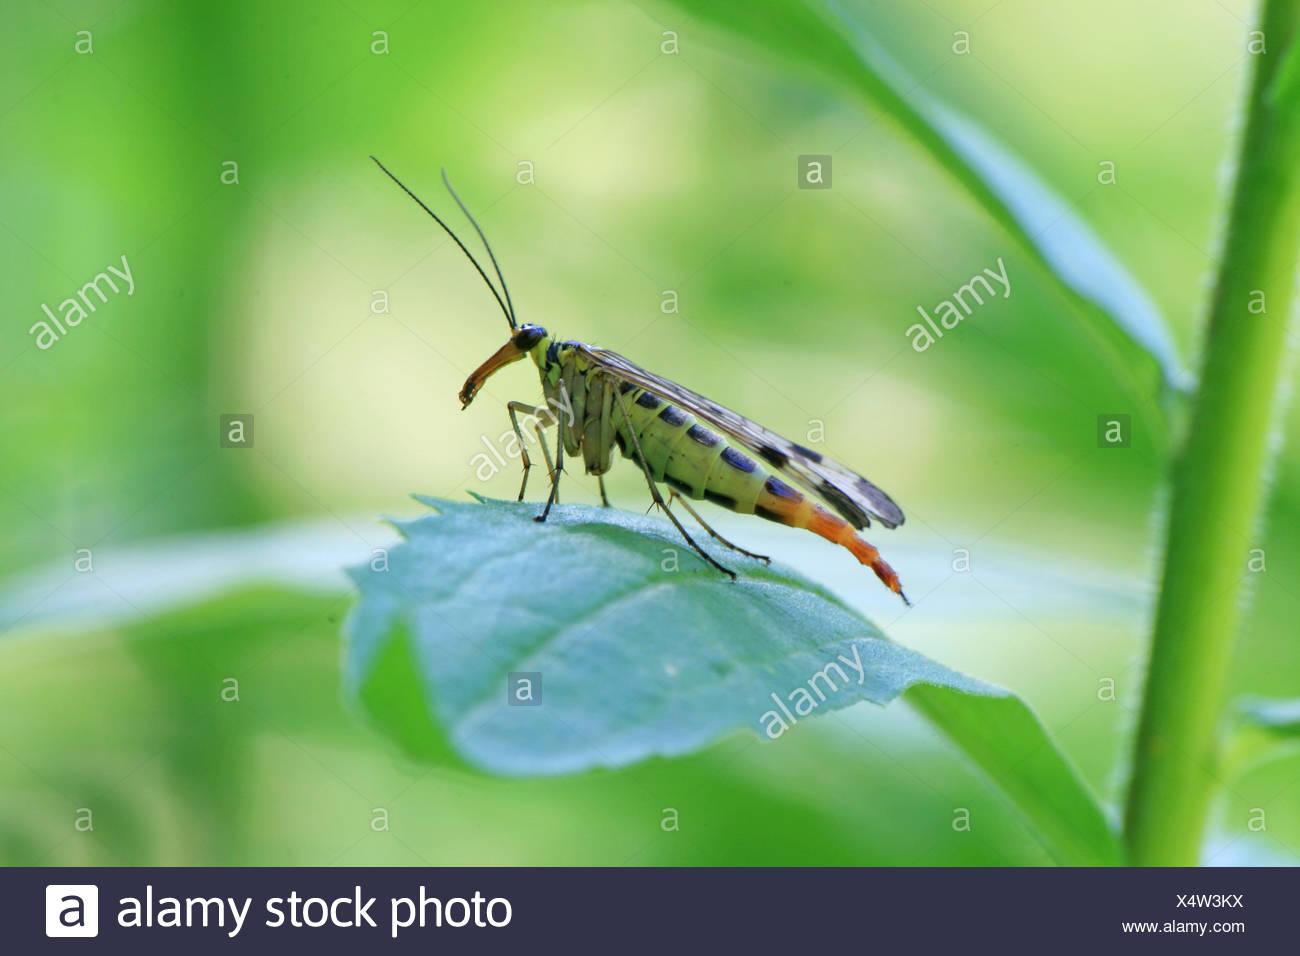 macro, close-up, macro admission, close up view, animal, insect, macro, - Stock Image